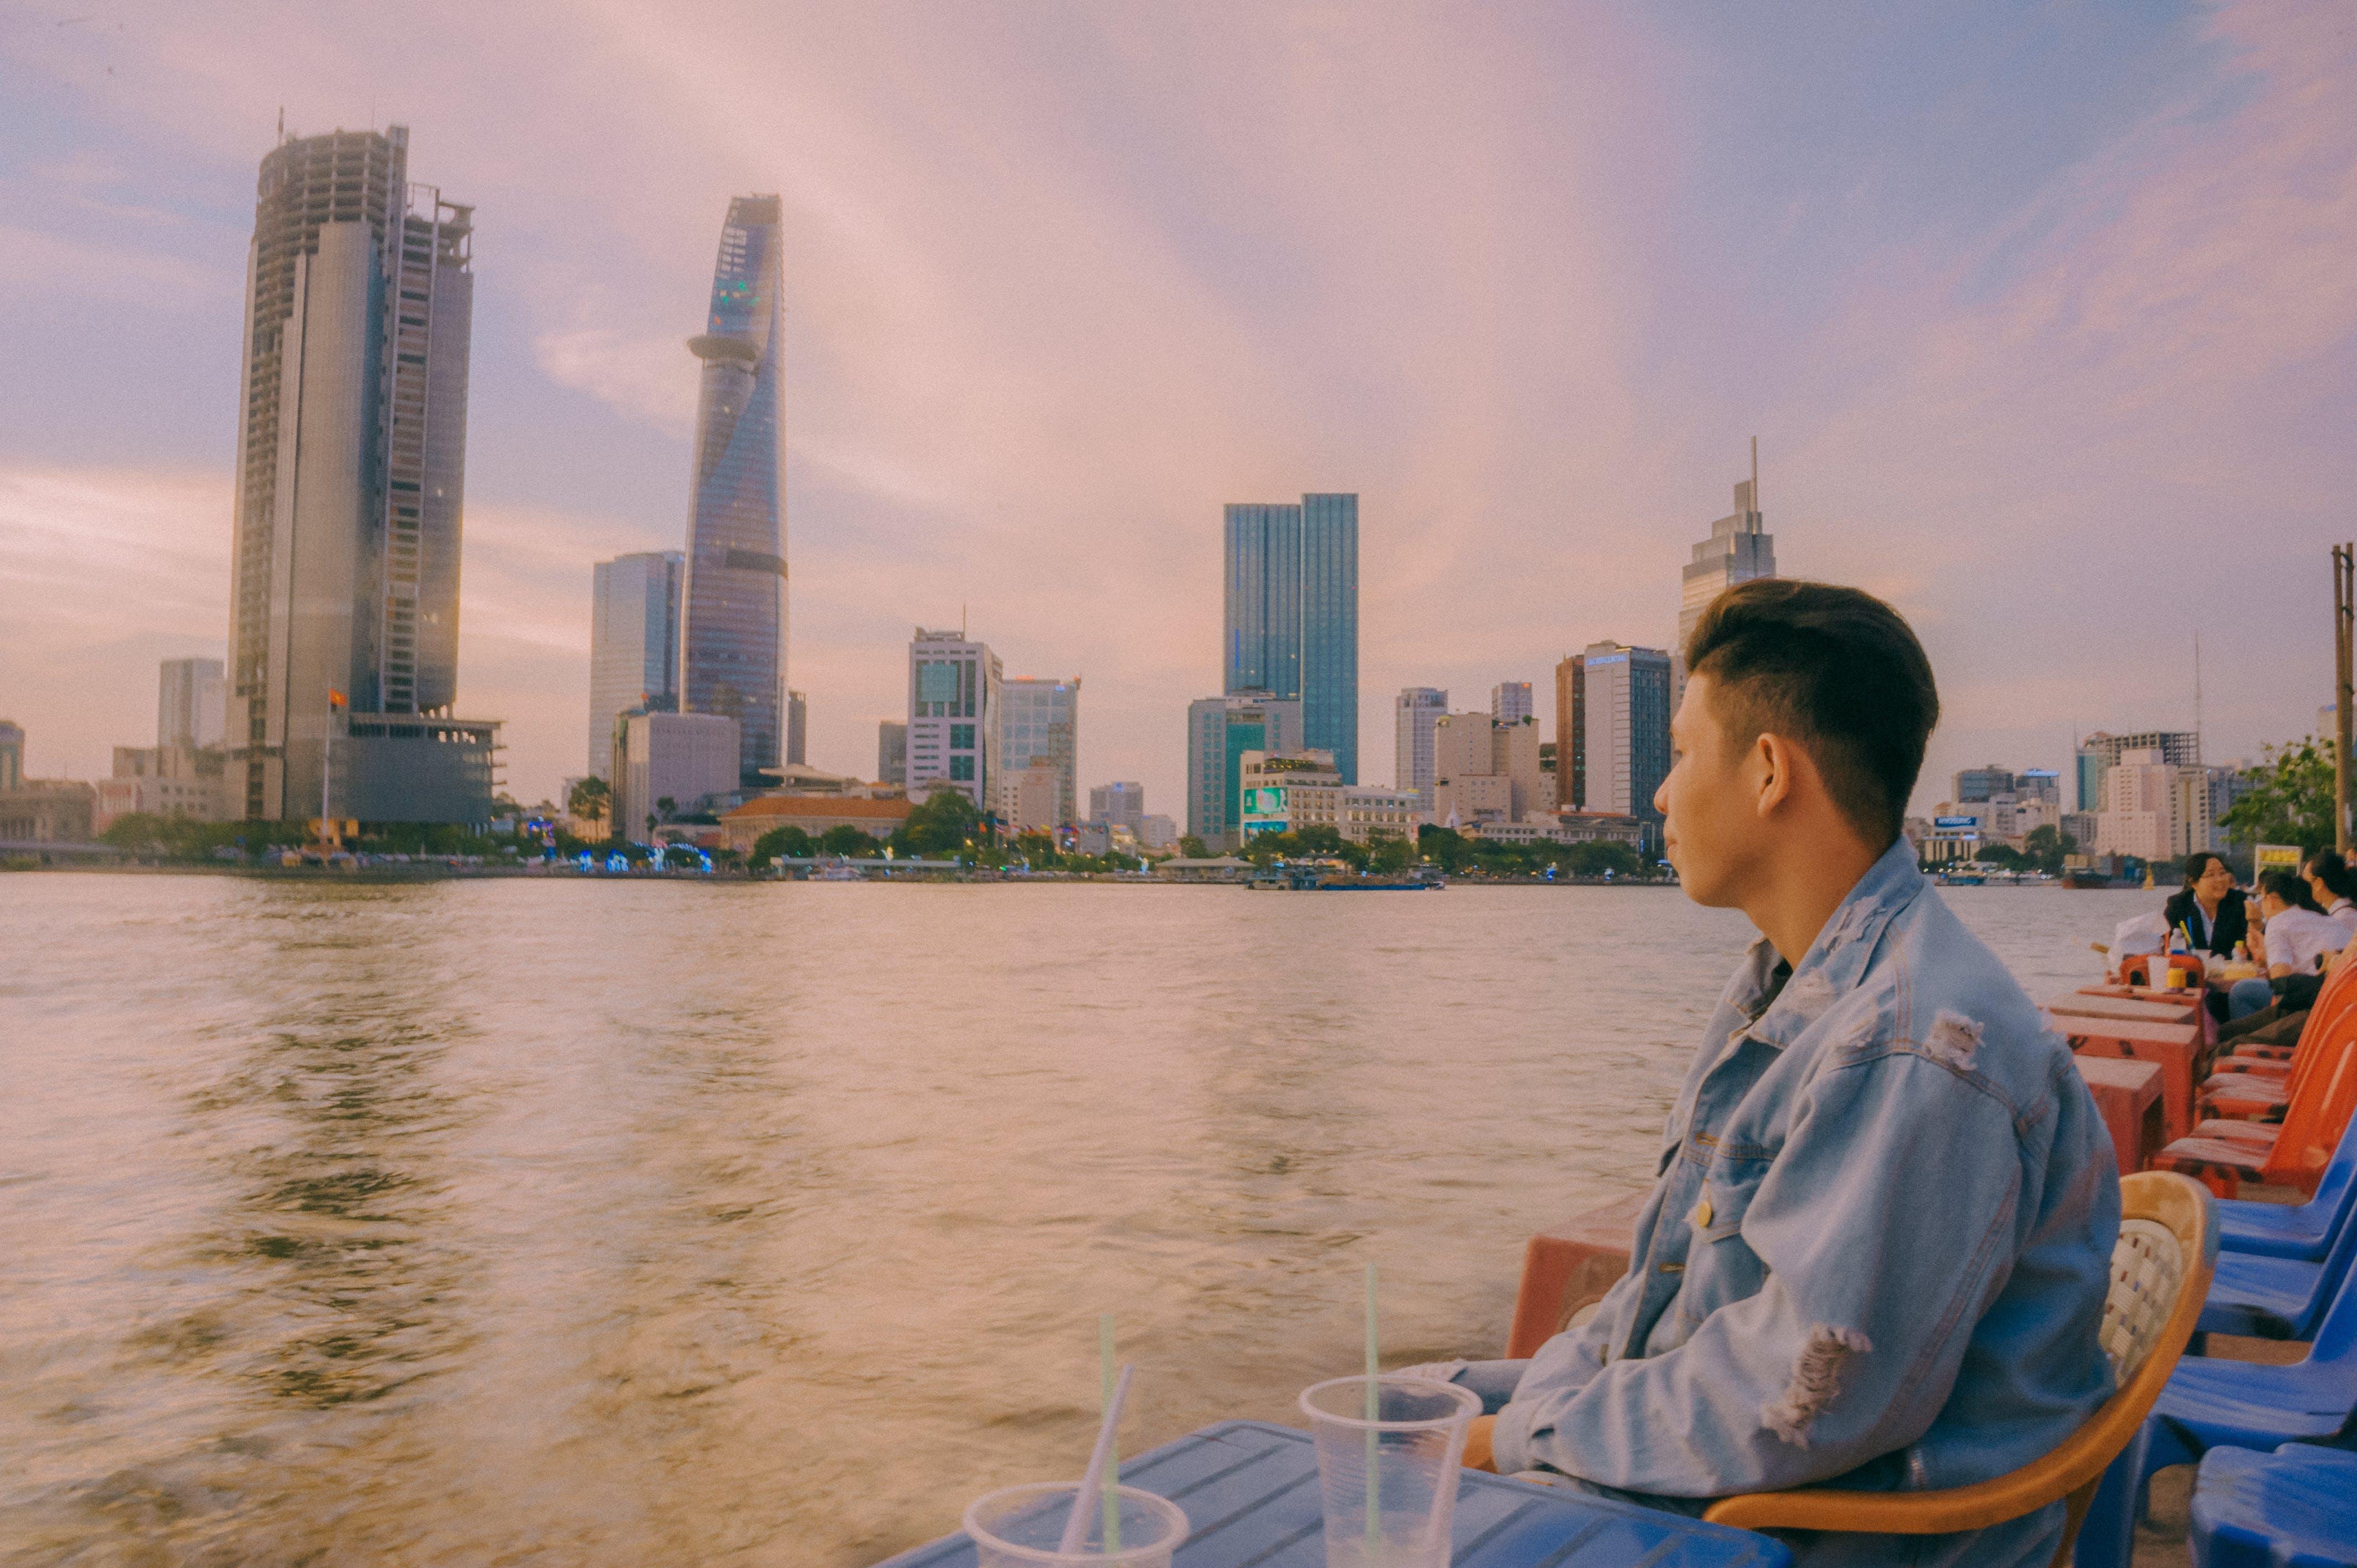 Man in Denim Jacket Sitting Near Body of Water